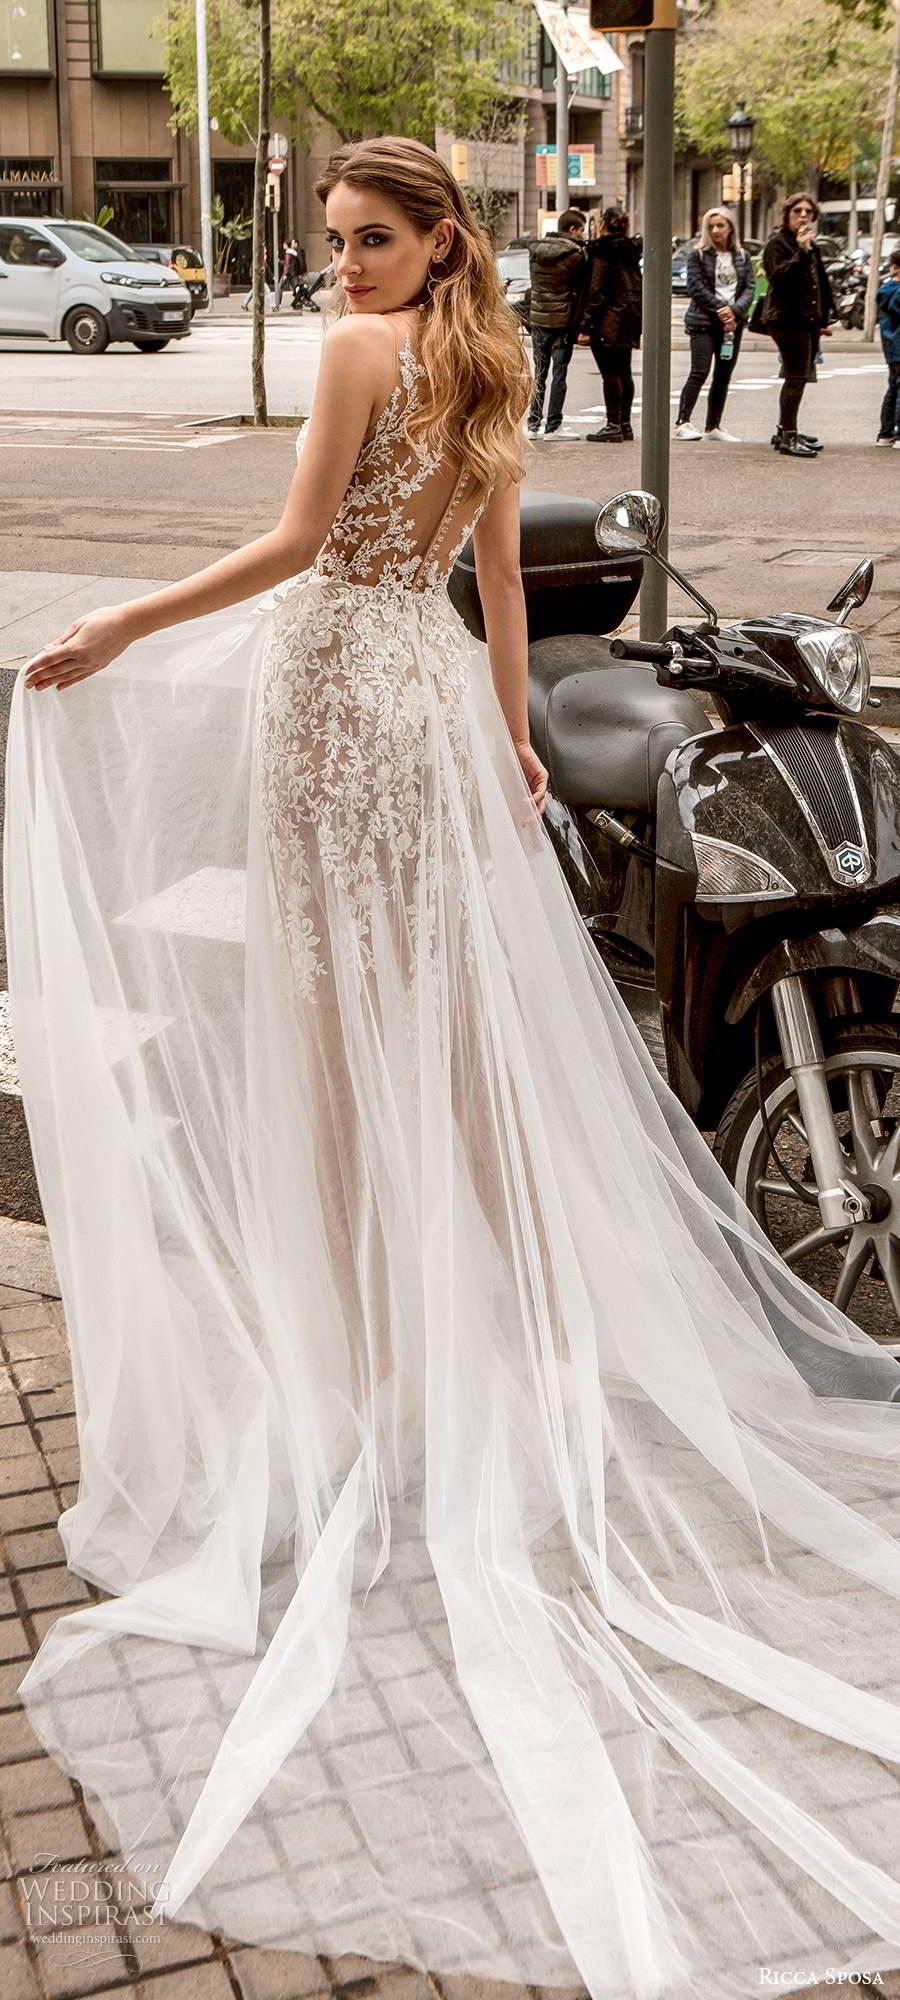 ricca sposa 2020 barcelona bridal sleeveless illusion straps plunging v neckline sheer bodice fully embellished lace a line blush wedding dress illusion bodice chapel train (7) bv